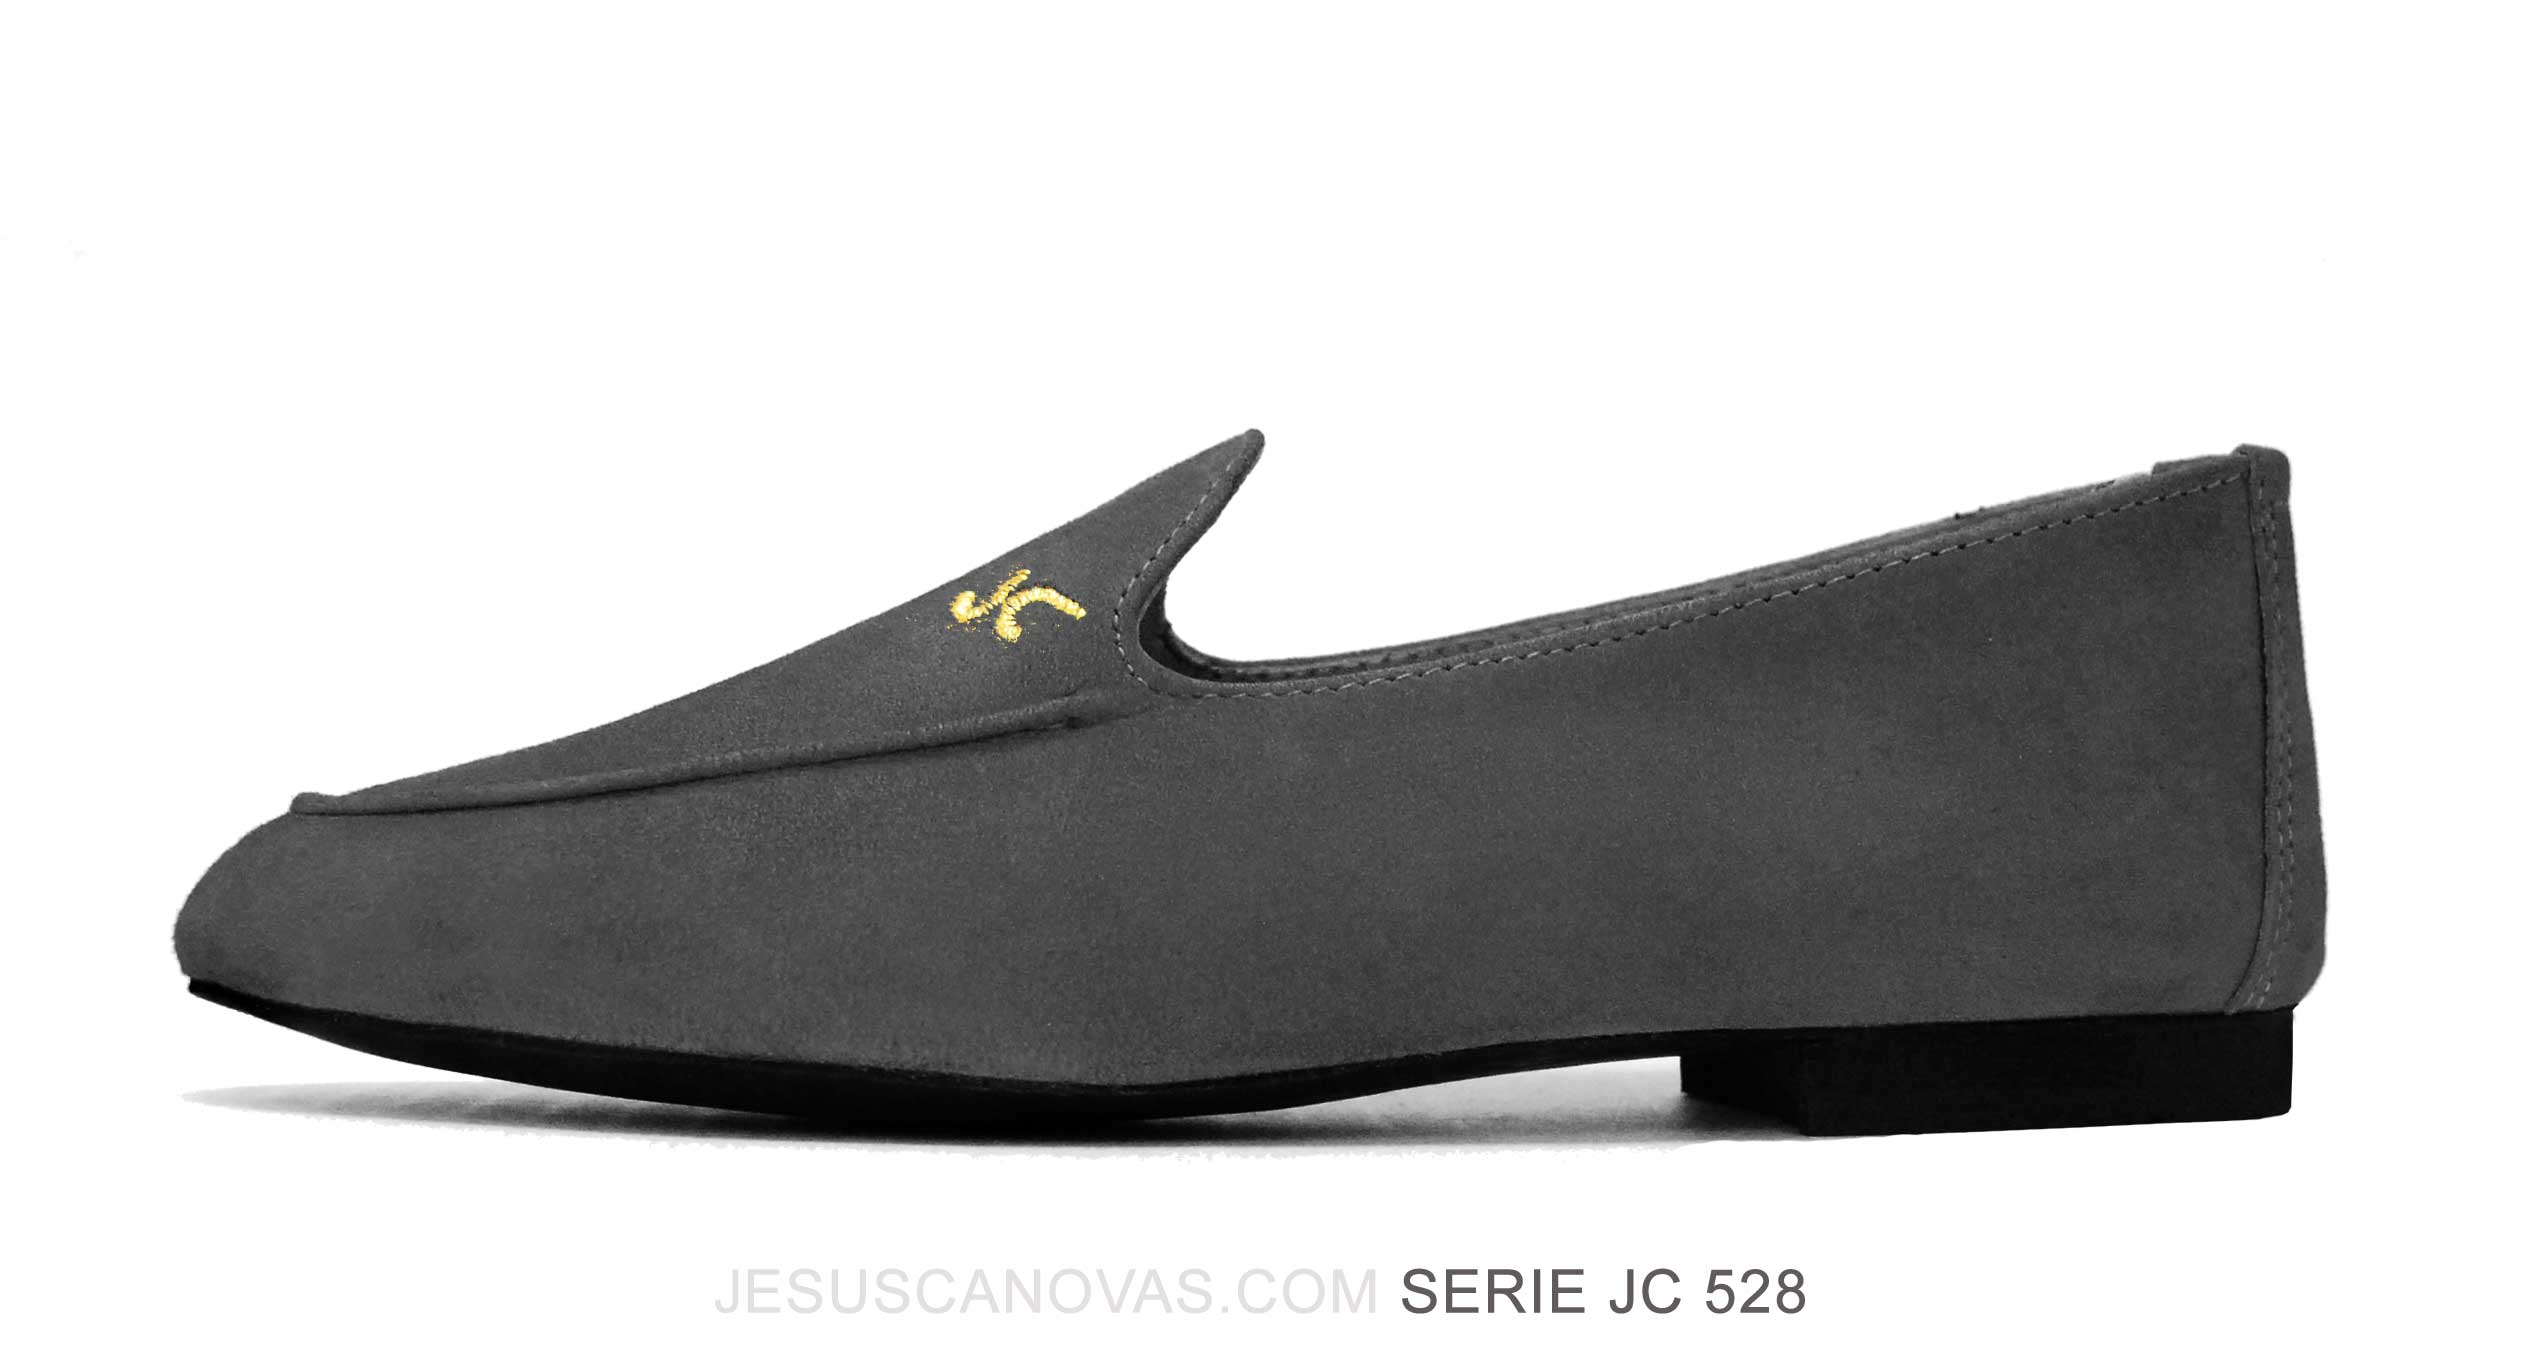 Foto 1 de Zapatos Julio Iglesias Mocasin Graphite Ante